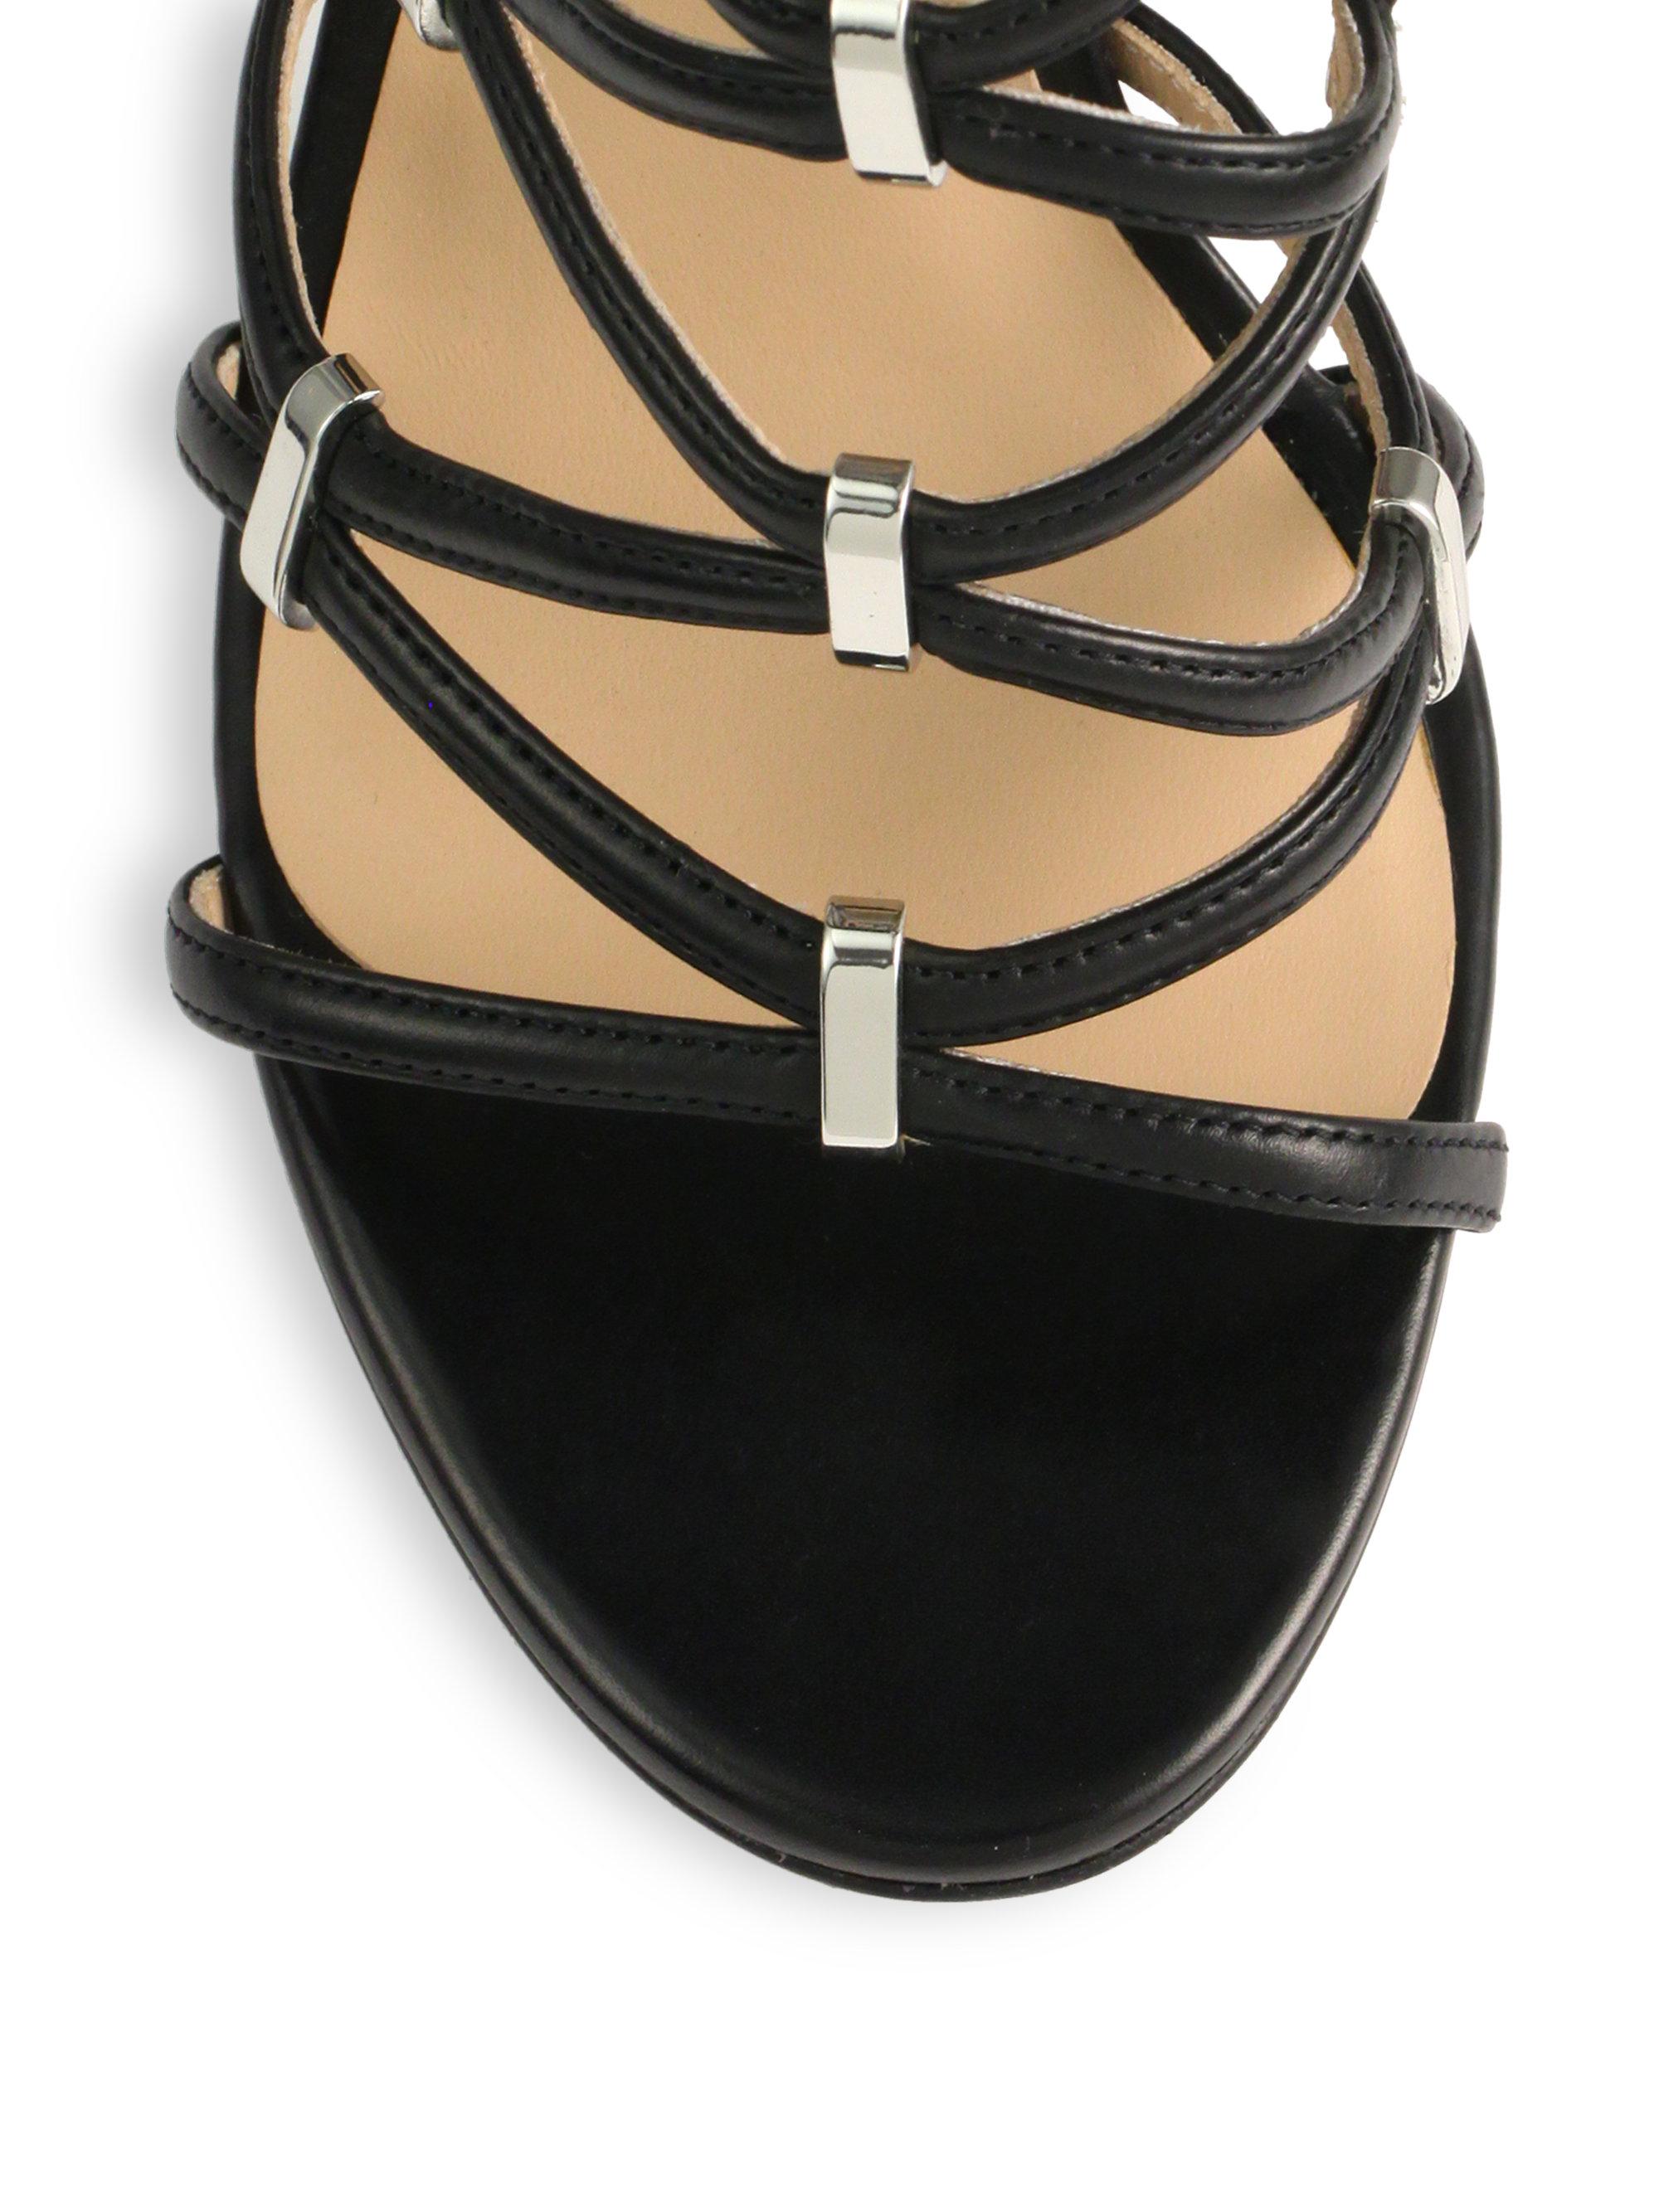 9ea379fe0400 Lyst - Michael Kors Charlene Leather Sandals in Black